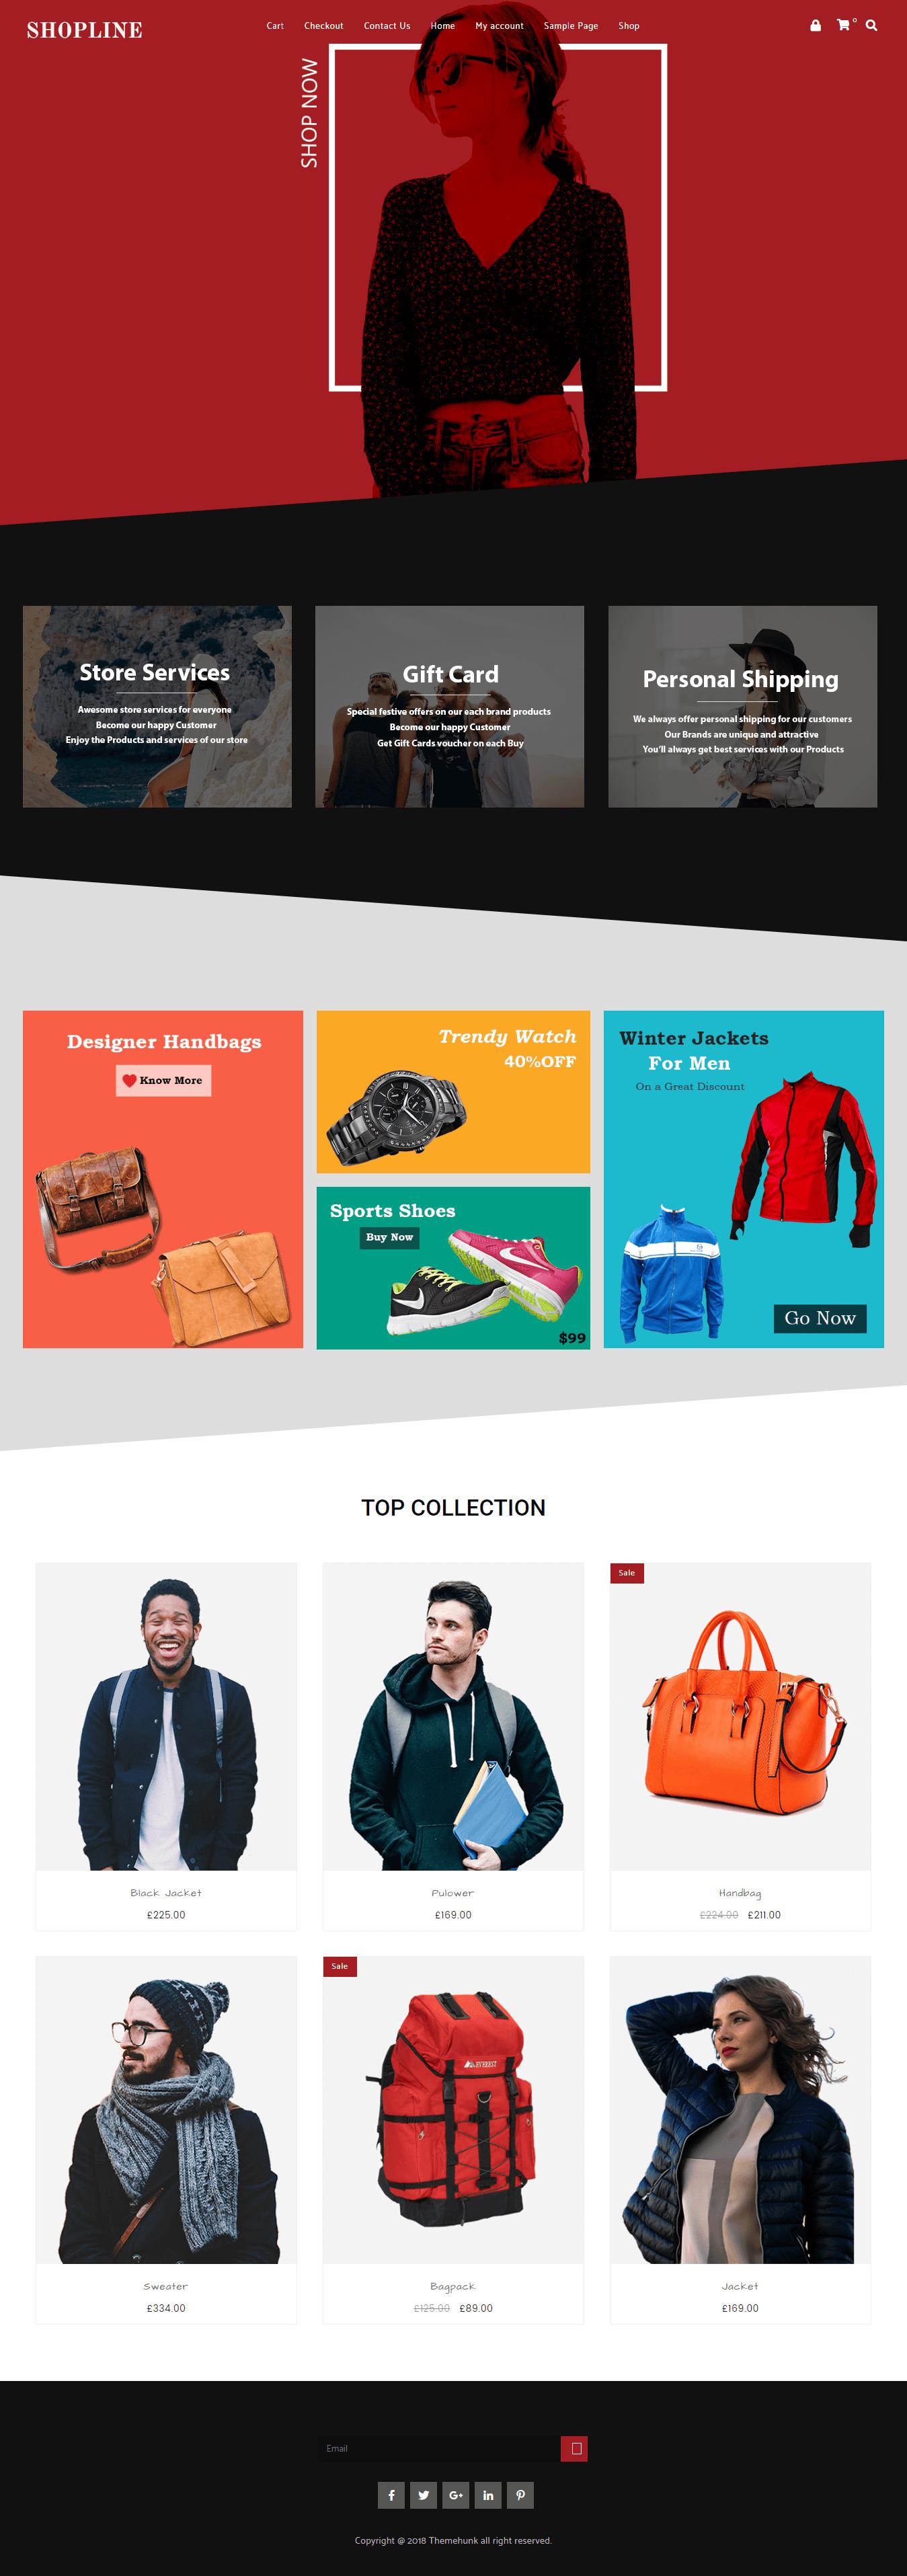 Shopline Pro Demo 4